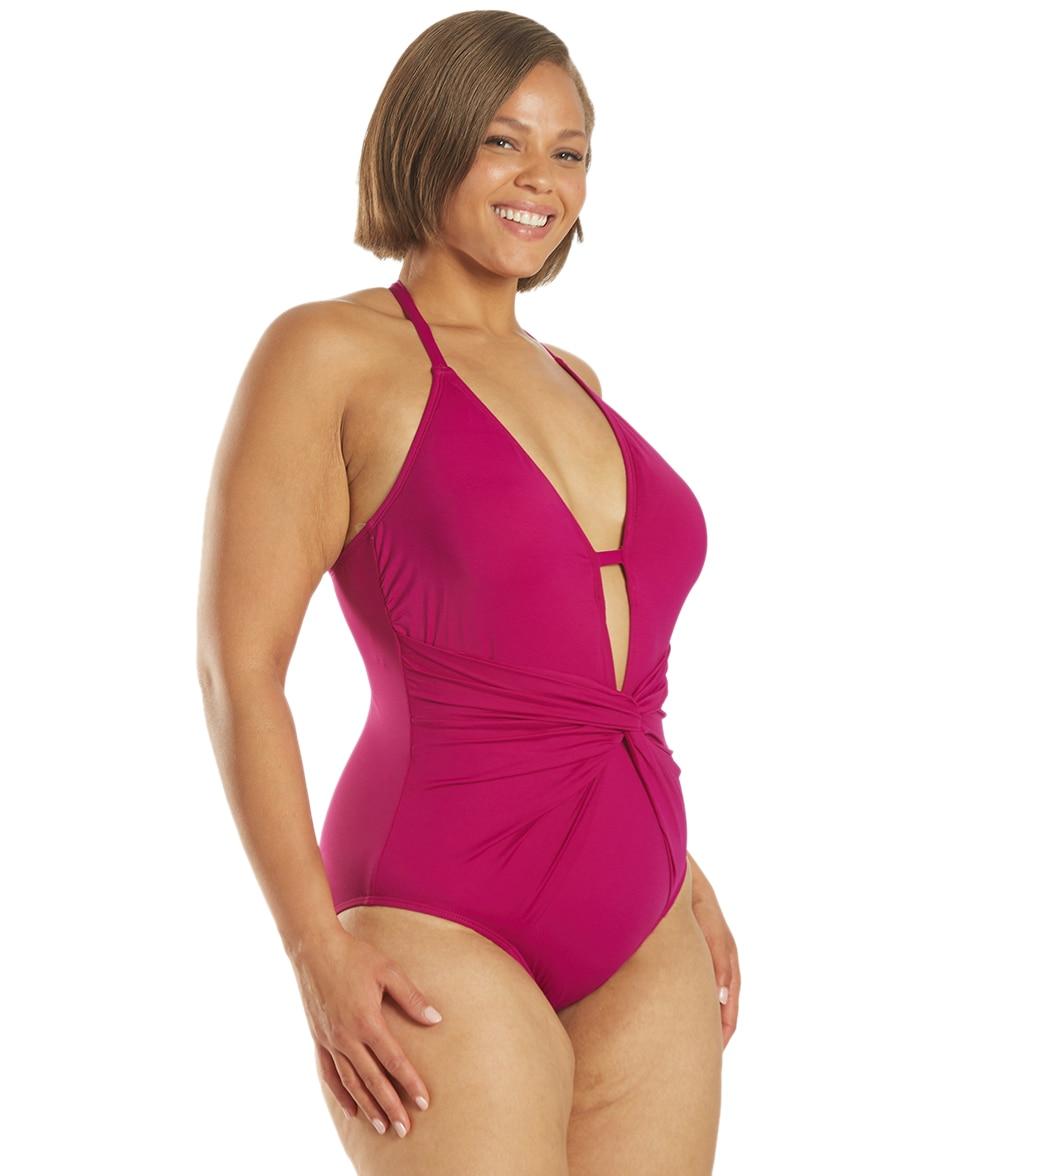 c5175bbd46 La Blanca Plus Size Island Goddess Twist One Piece Swimsuit at ...